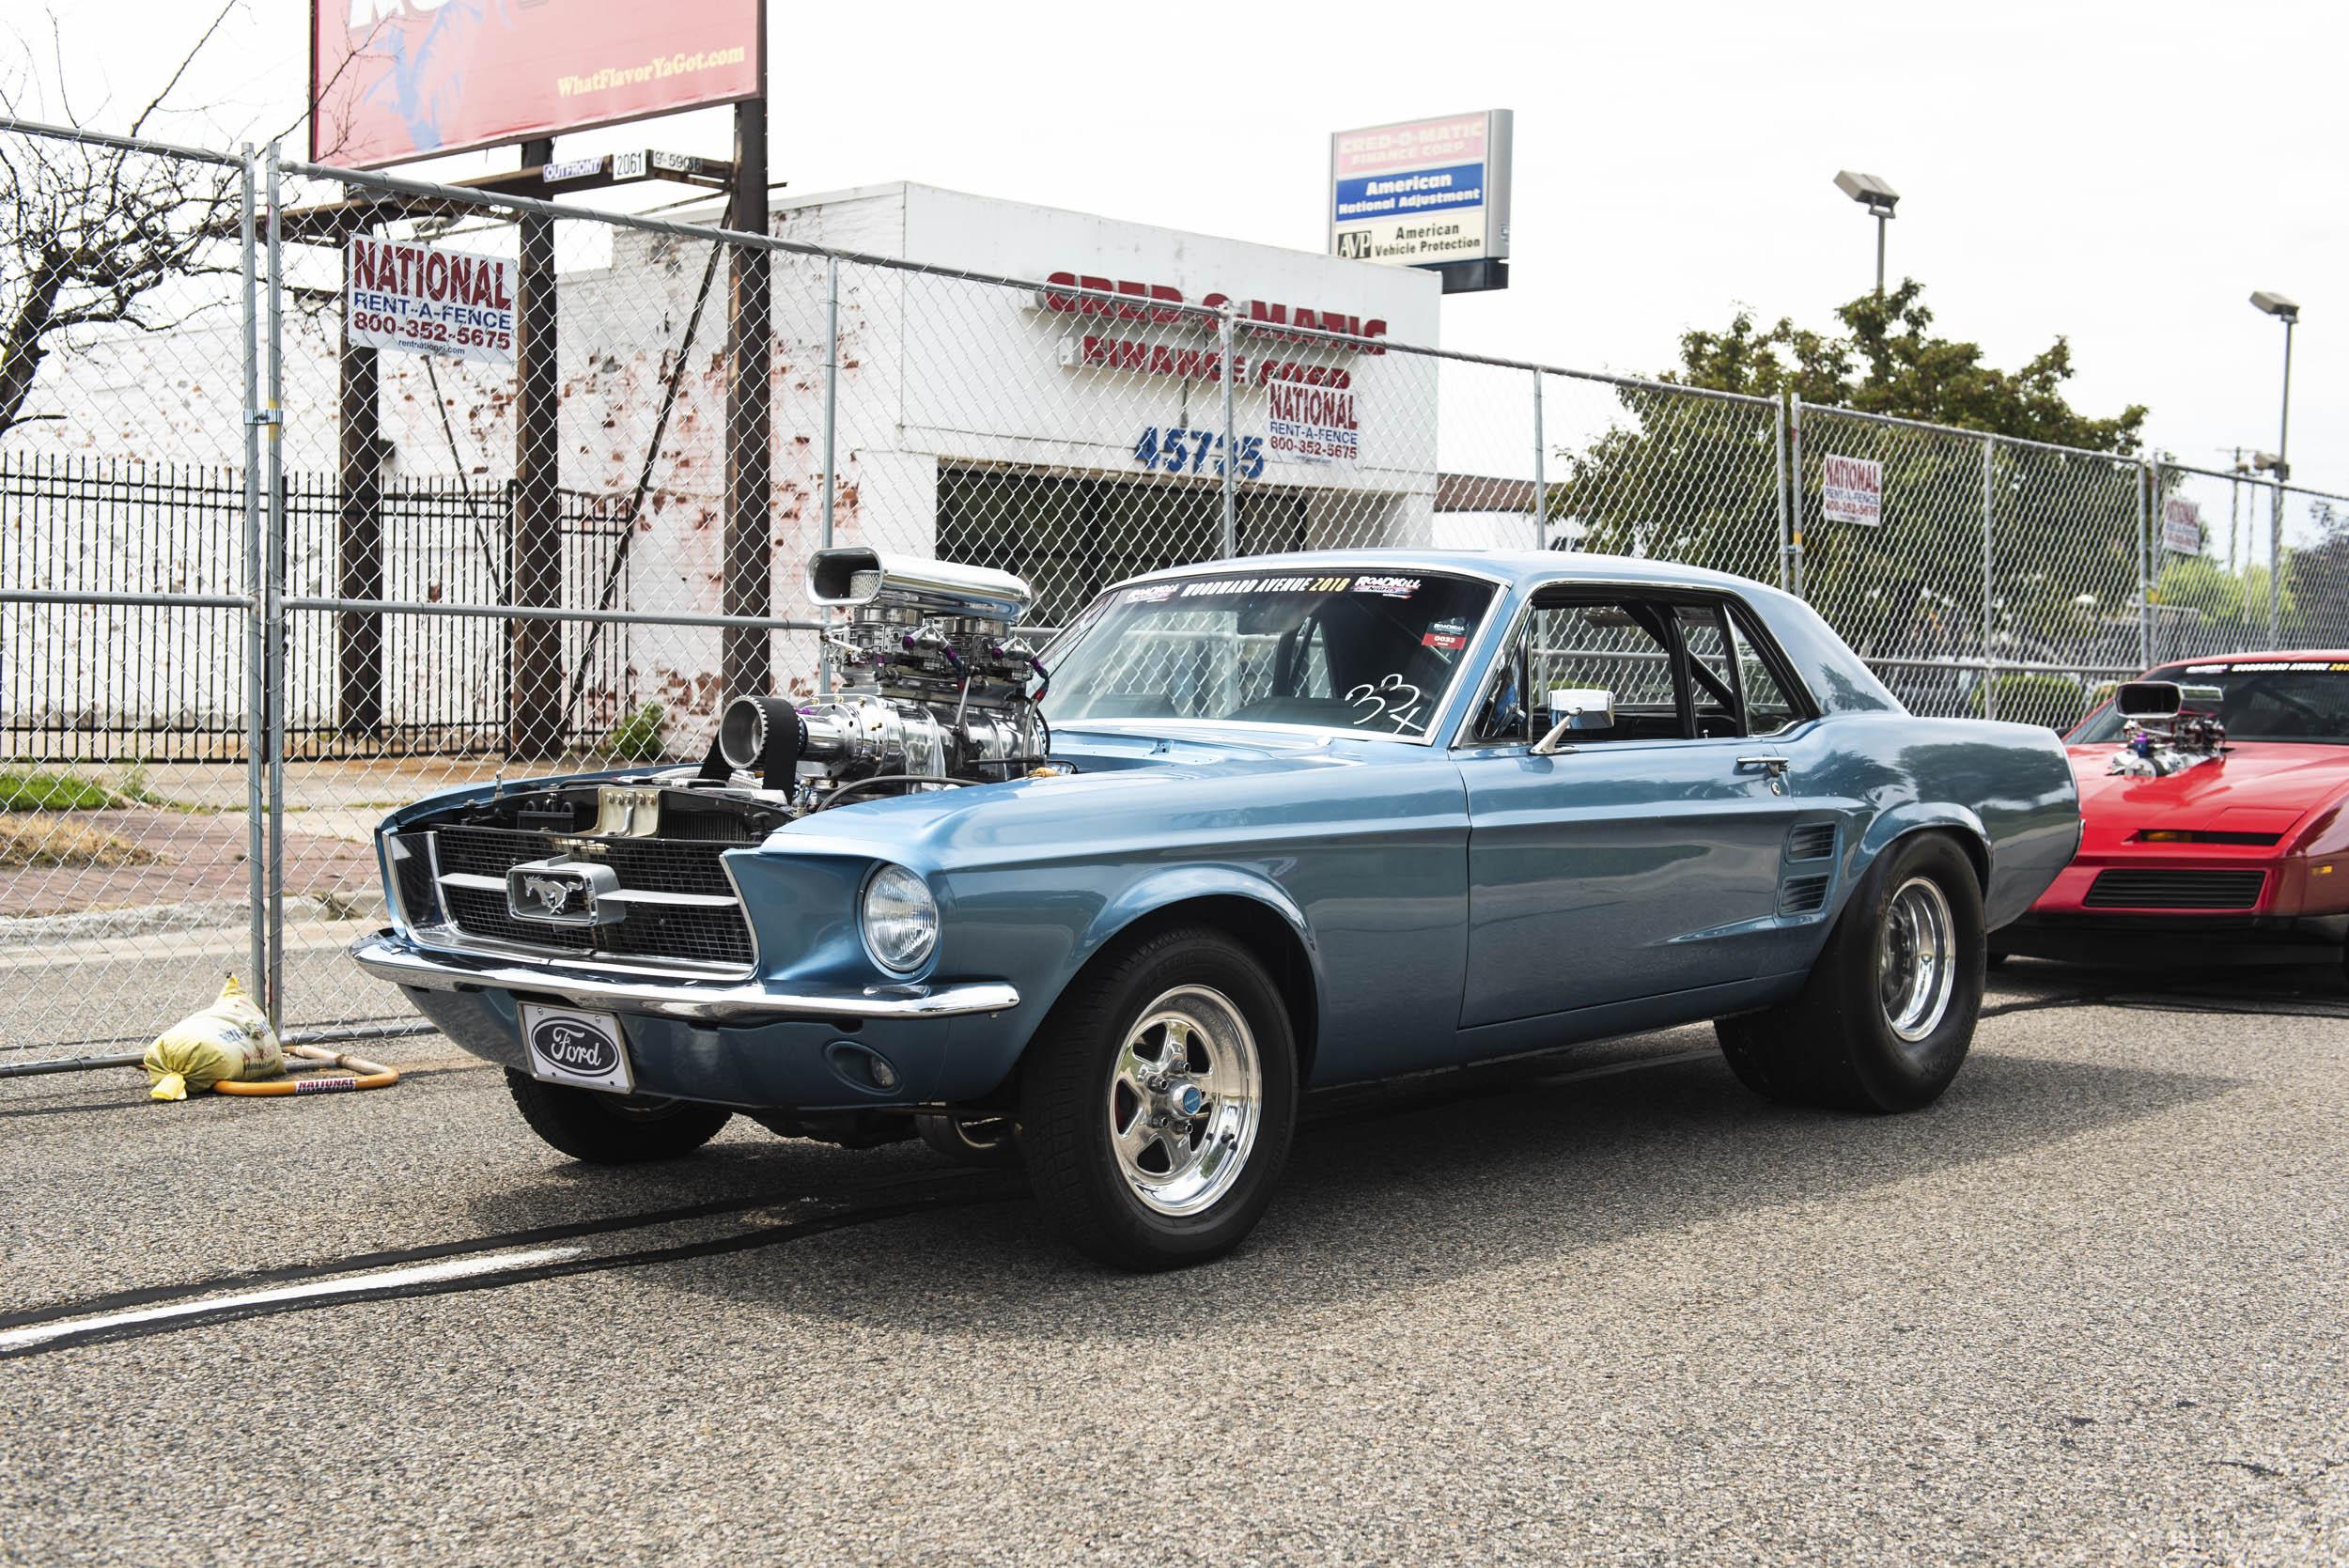 blown out Mustang at Roadkill nights